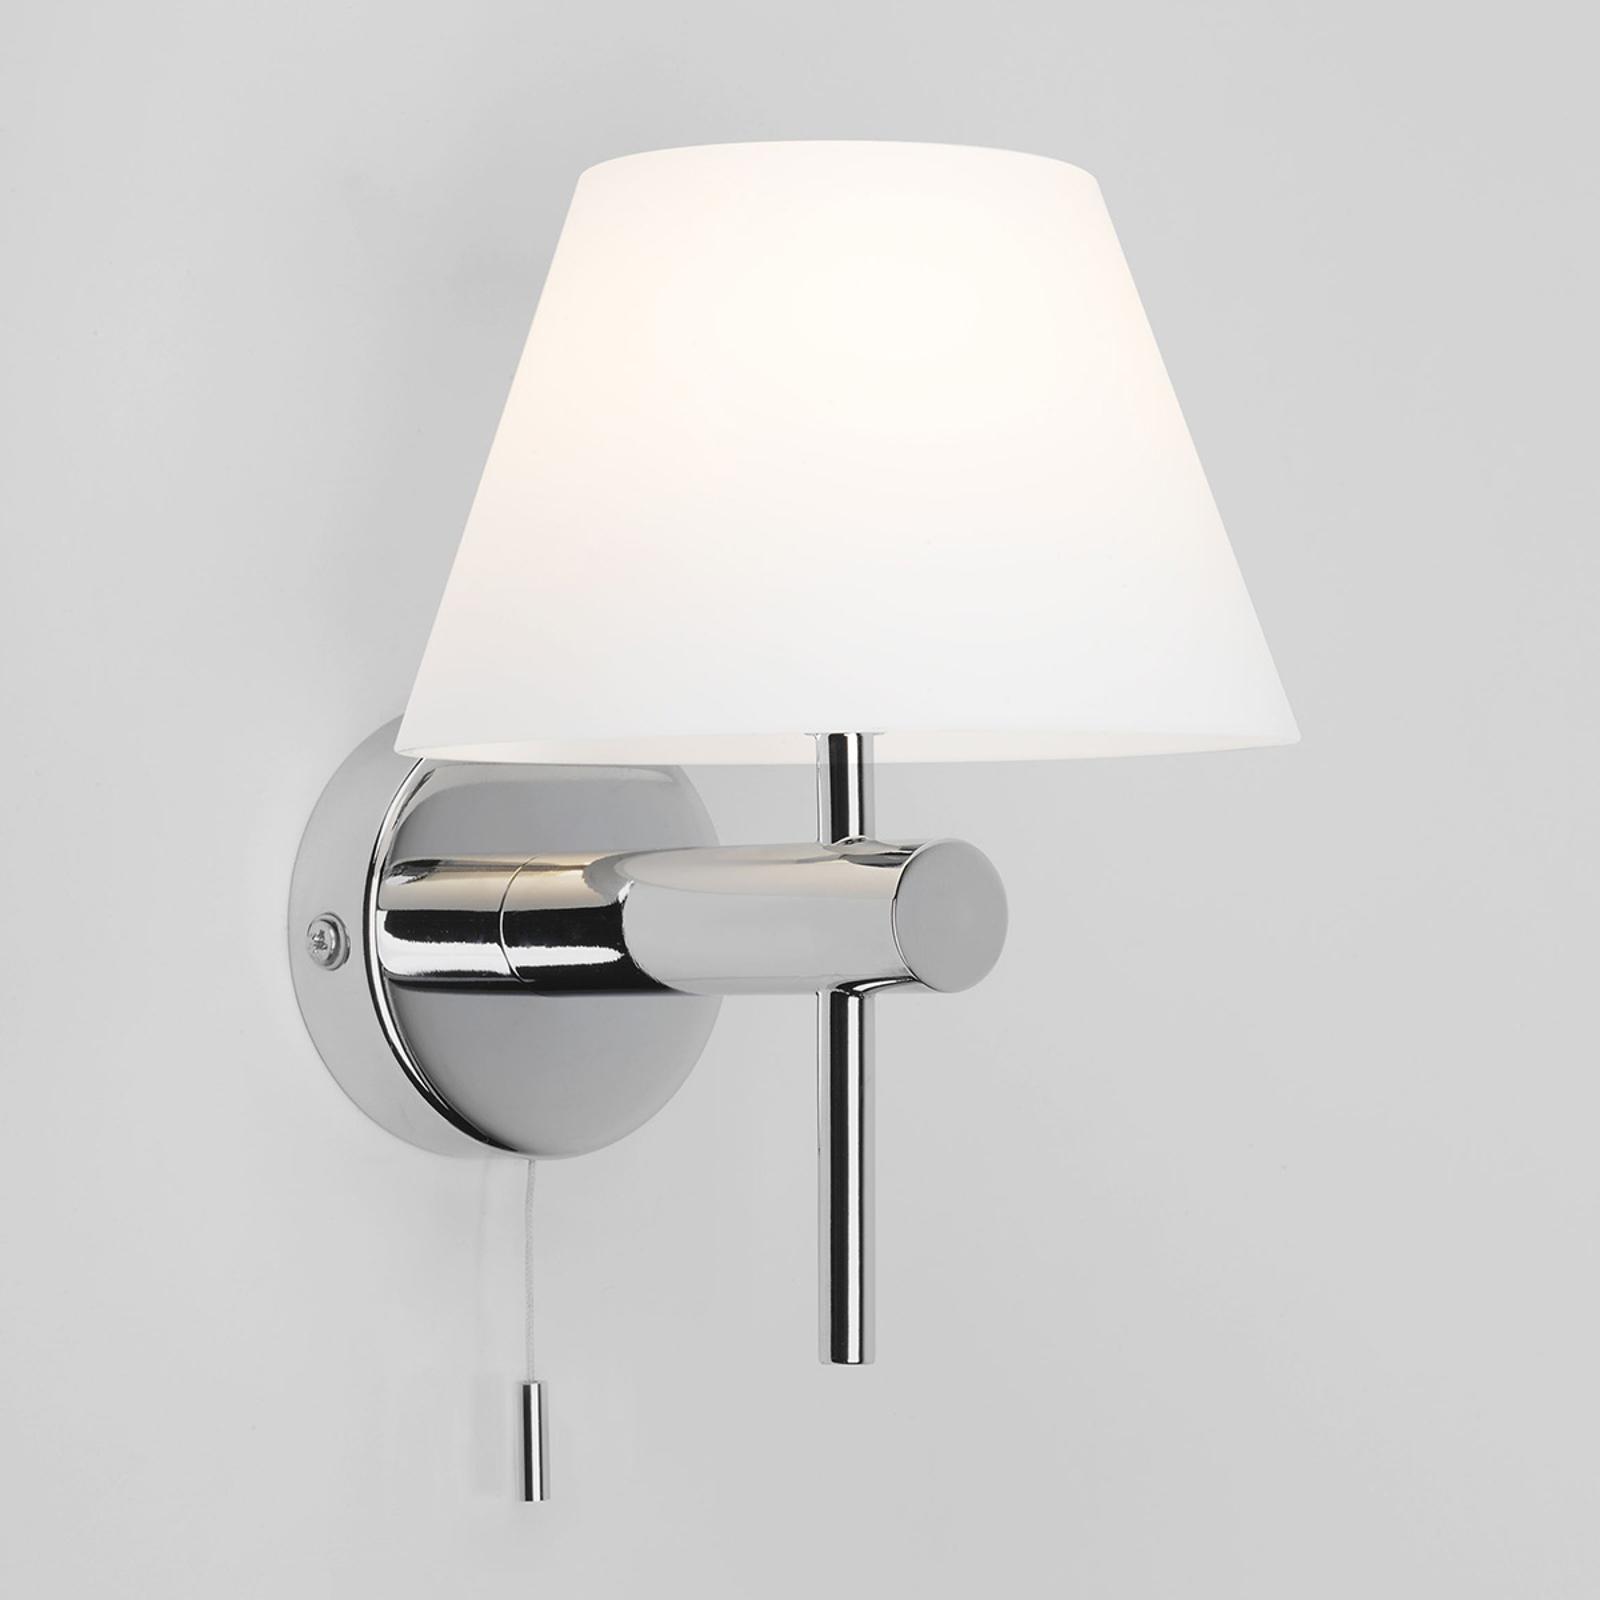 Astro Roma Switched badkamer wandlamp, chroom